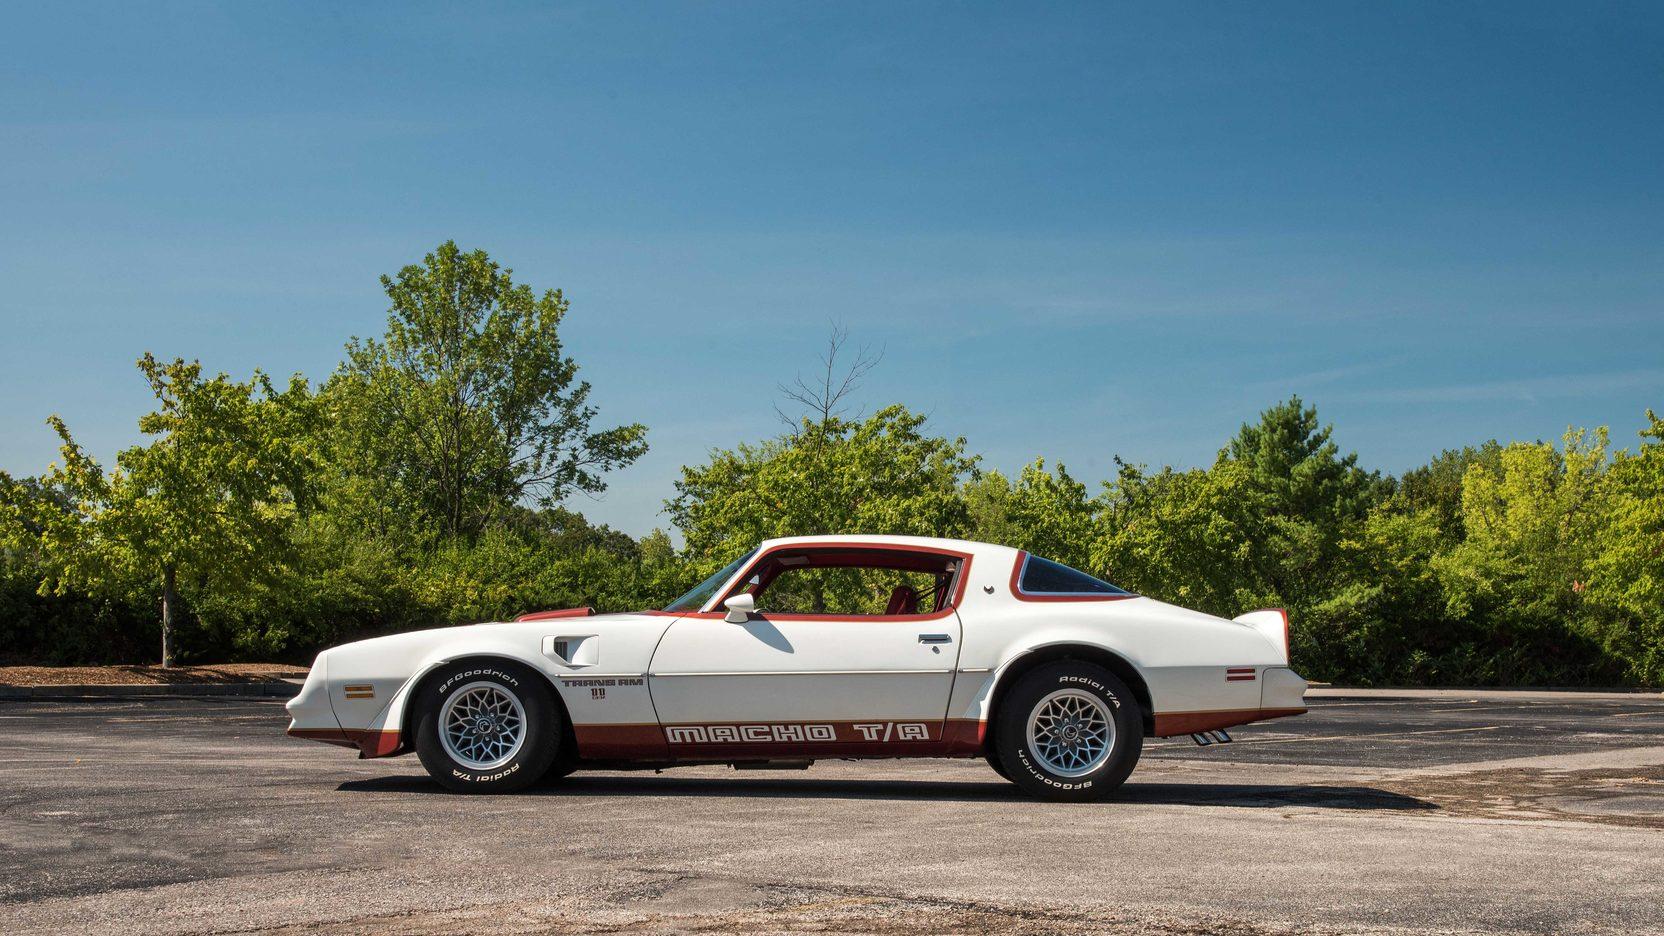 1978 Pontiac Macho Trans Am profile